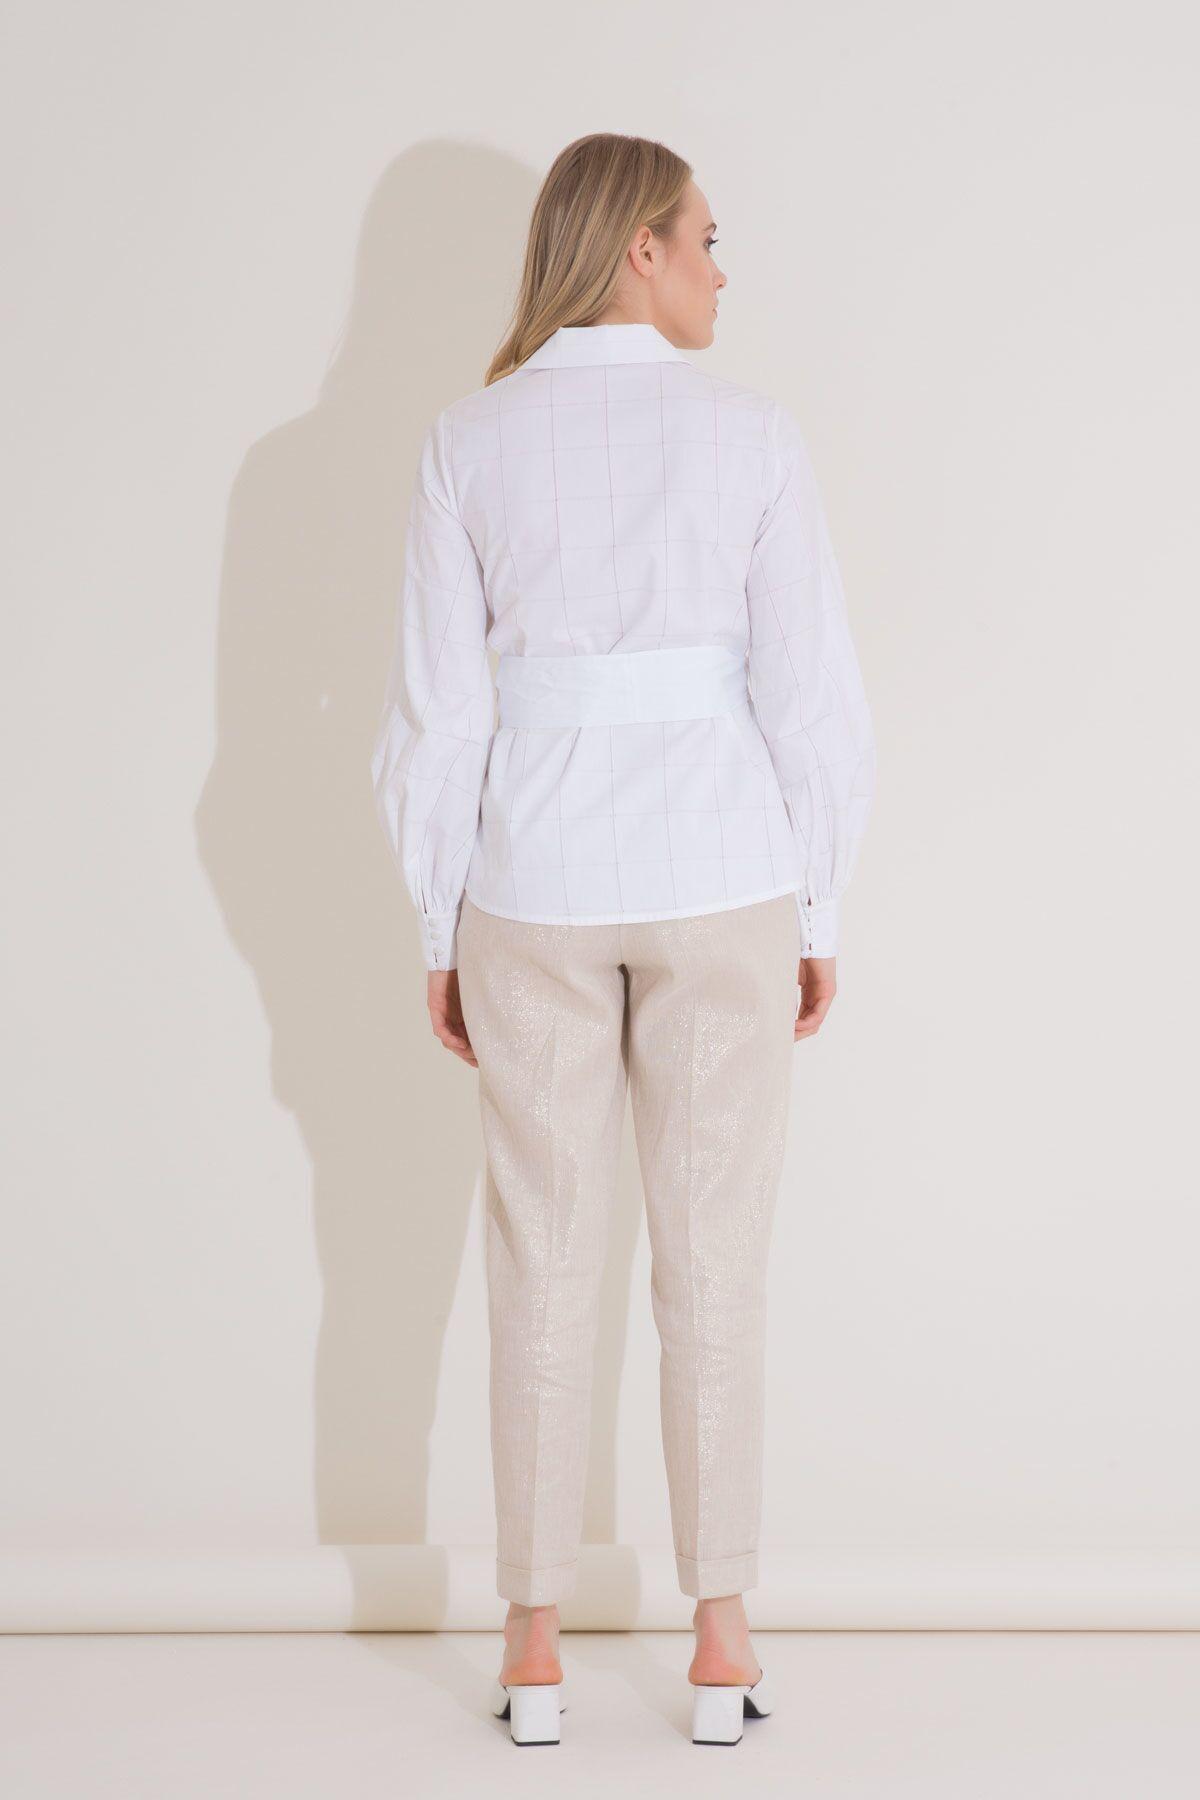 Asymmetric Cut Embroidered White Shirt